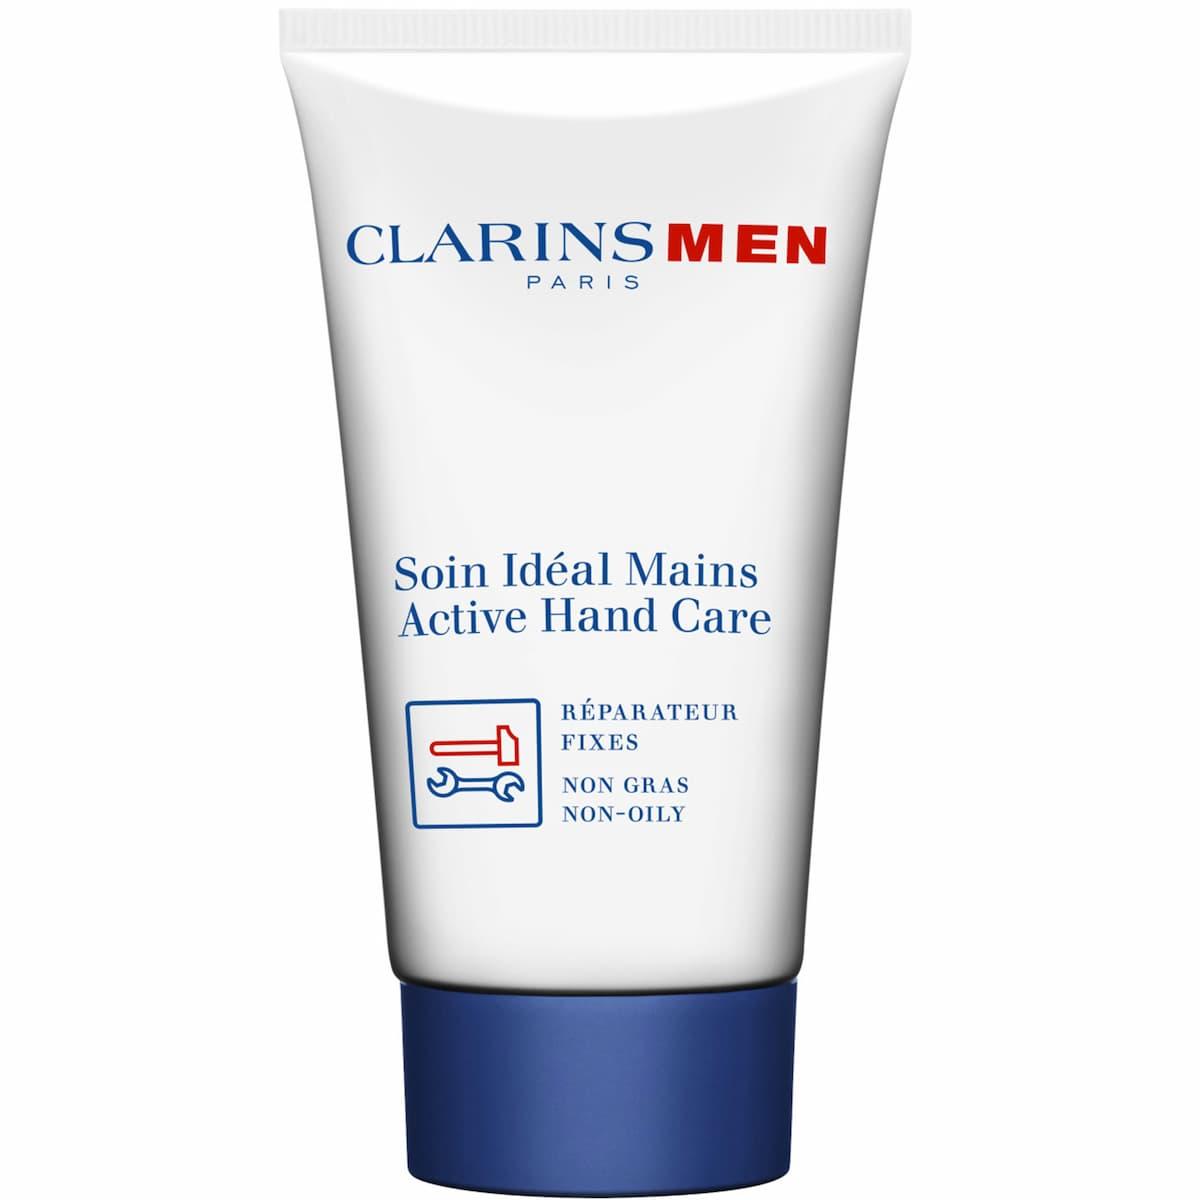 Soin Idéal Mains - CLARINS MEN